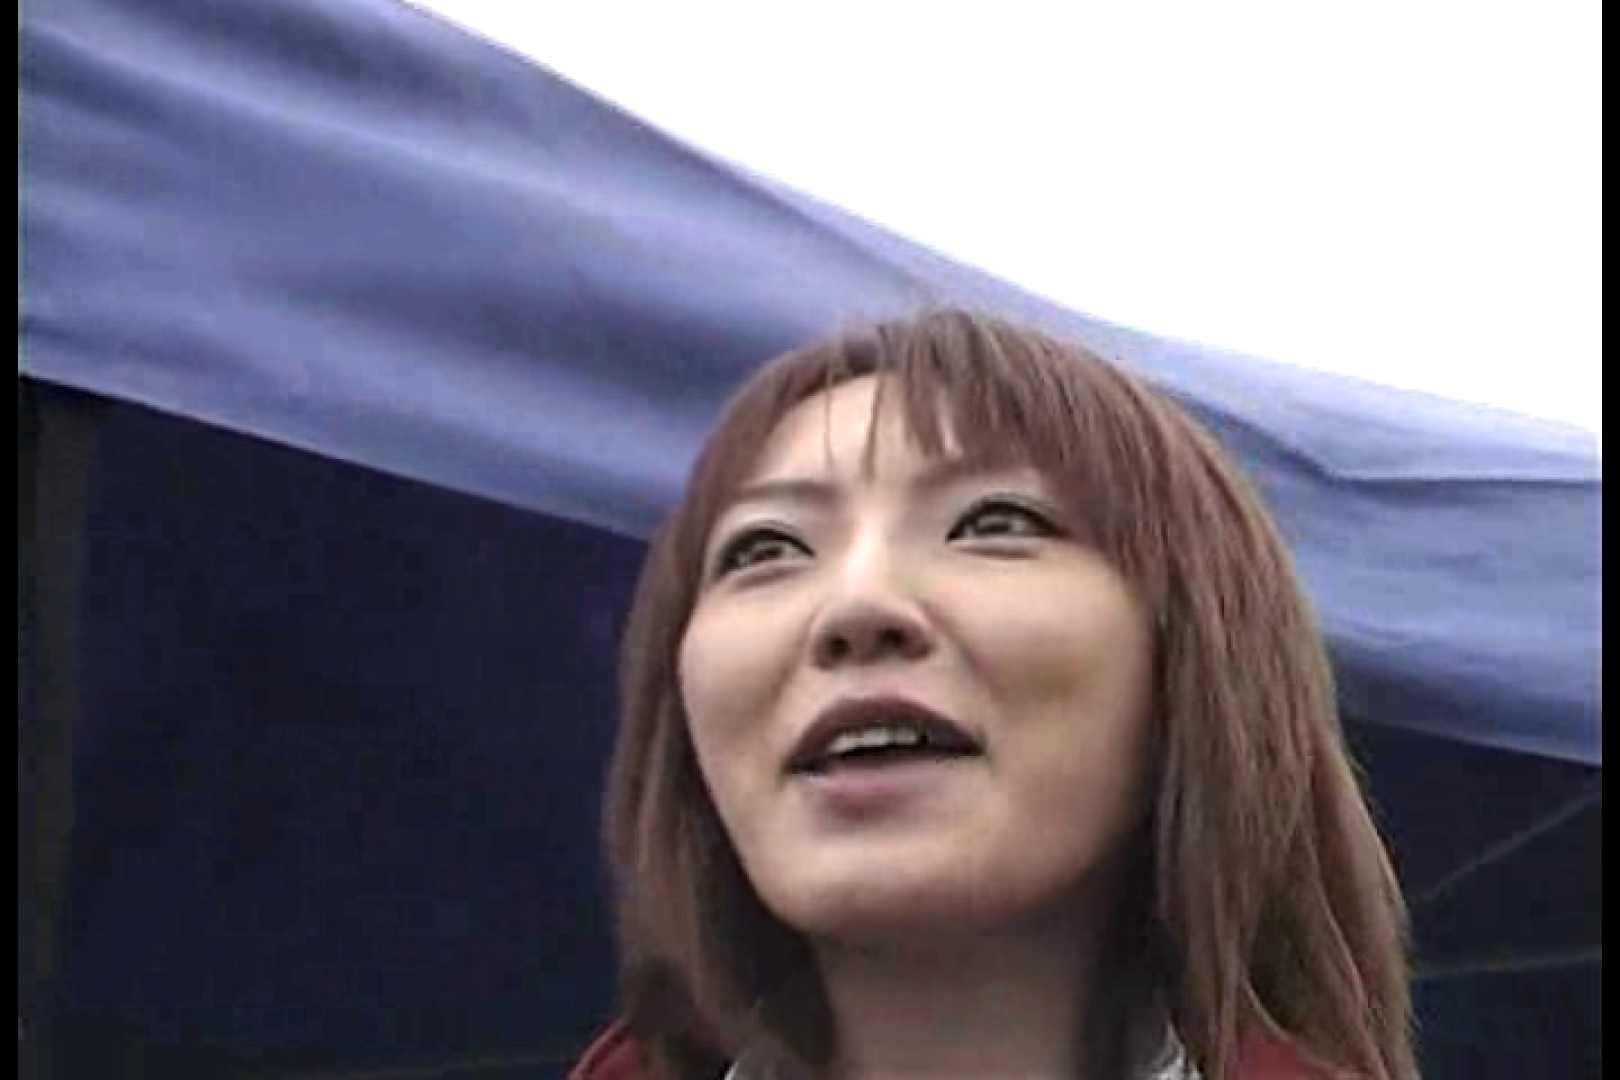 RQカメラ地獄Vol.4 マンコ映像   レースクイーン  73連発 43